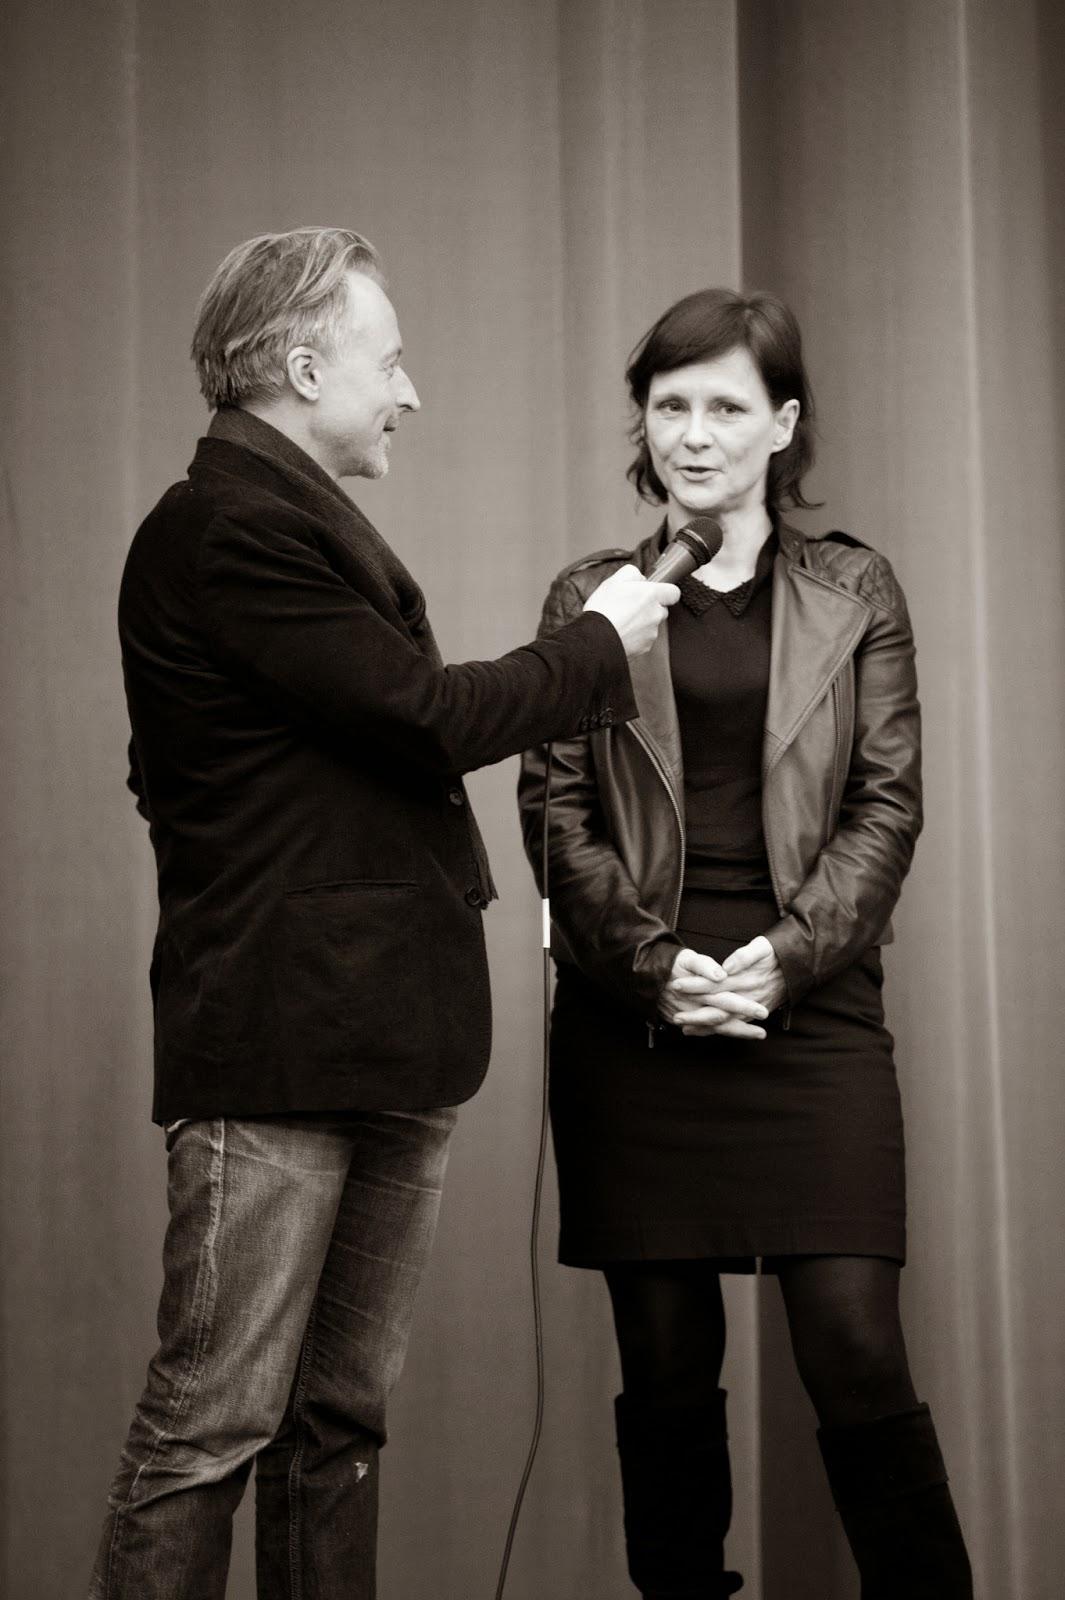 Olaf Stüber with Annika Eriksson